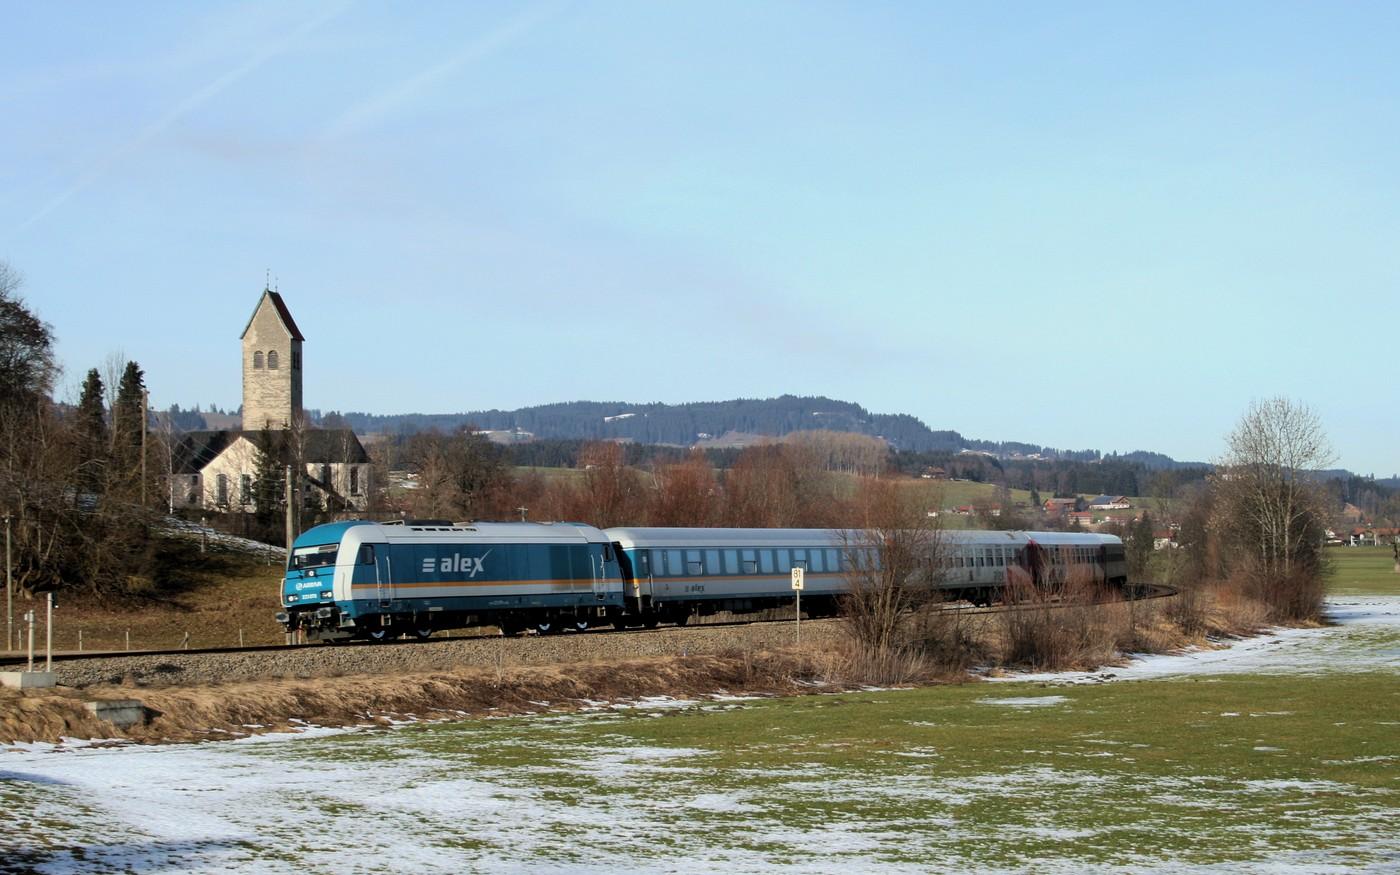 http://www.eisenbahn-im-bild.de/Temp/D_08_Immen_IMG_2981.jpg